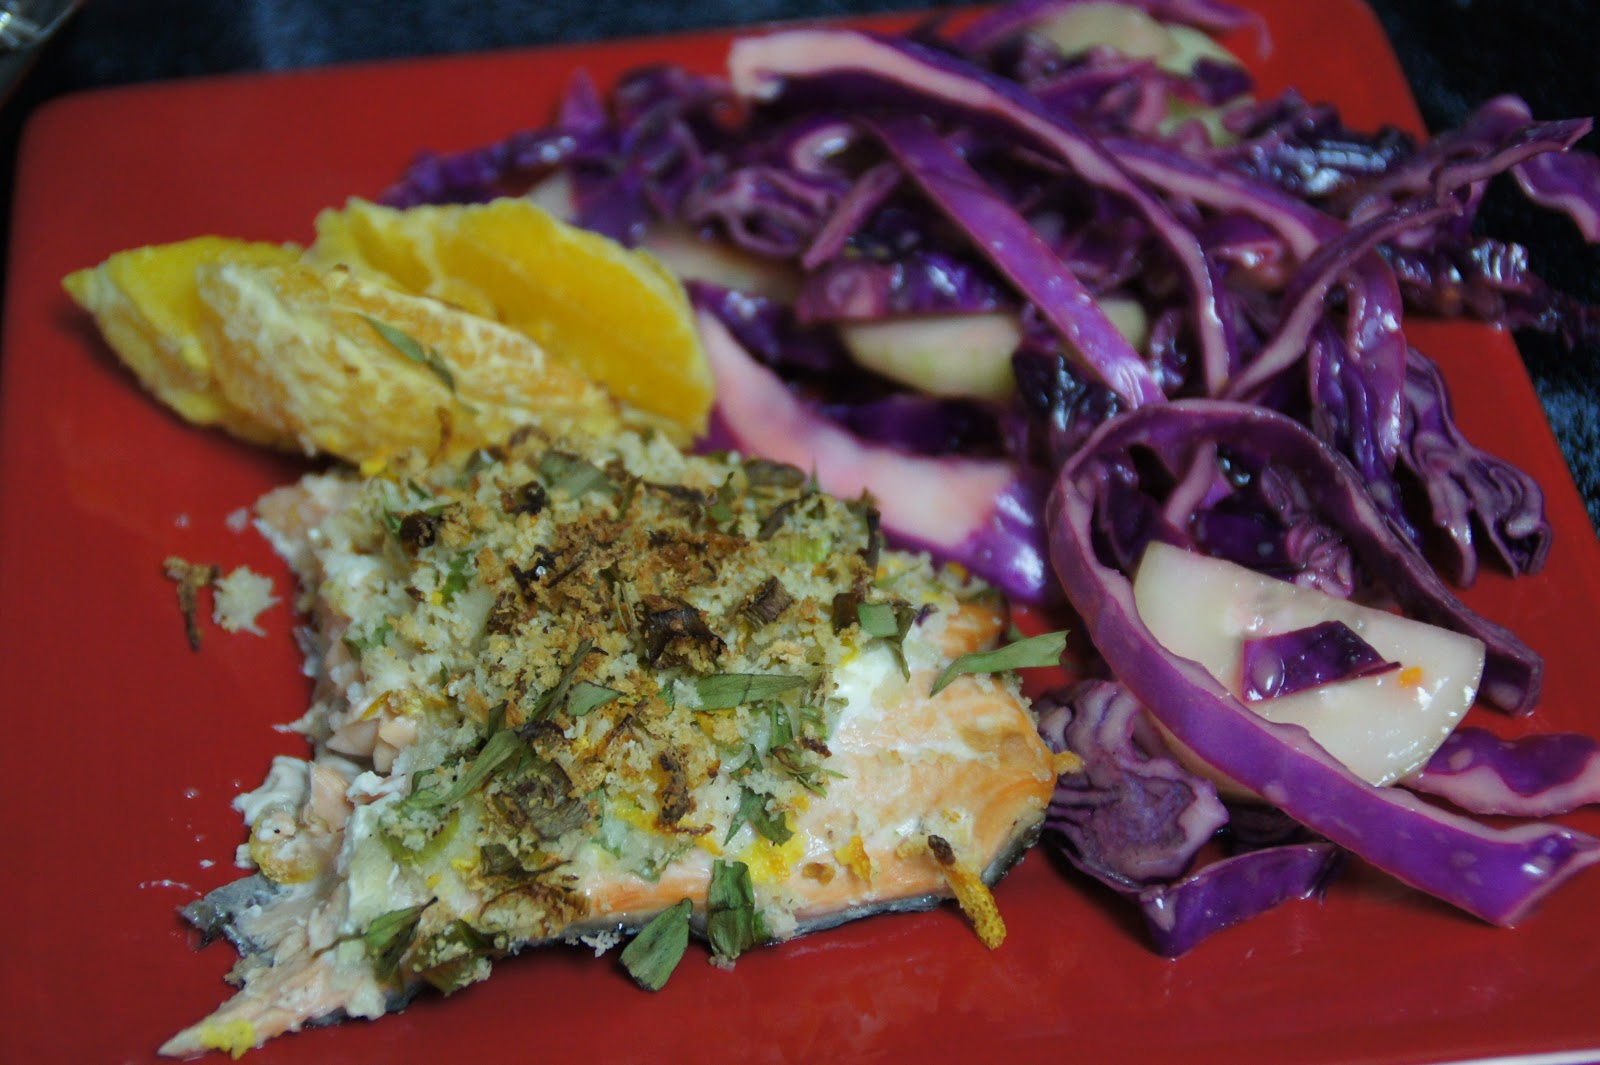 Tarragon-Citrus–Crusted Salmon Tarragon-Citrus–Crusted Salmon new pictures